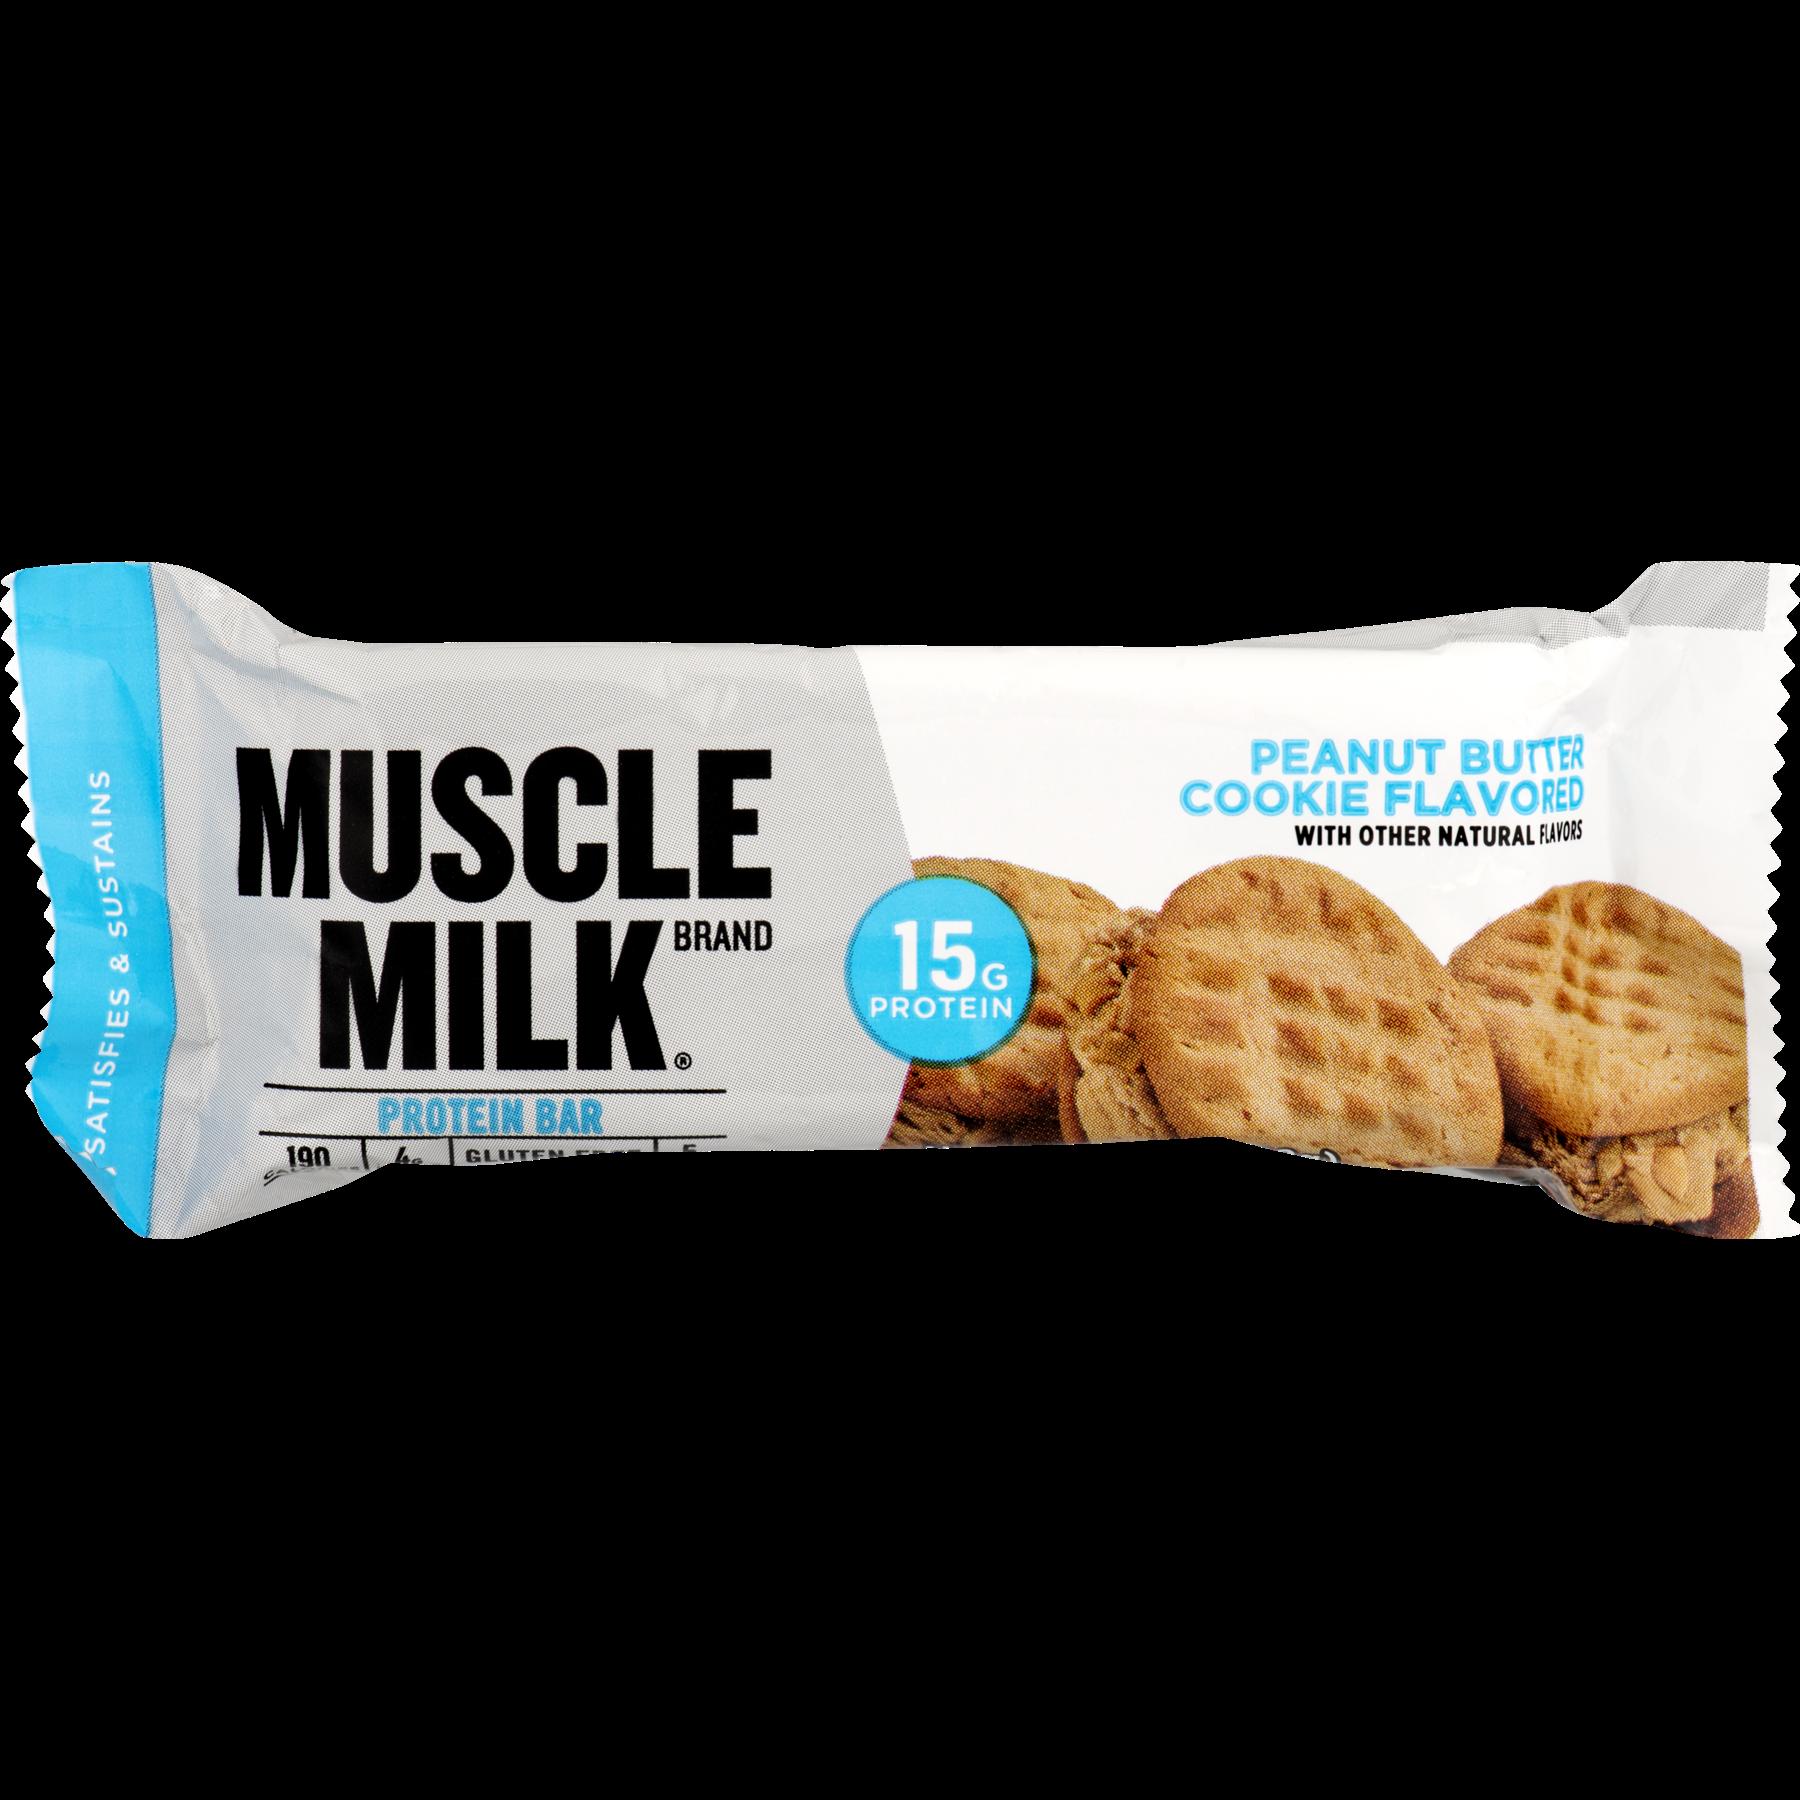 MUSCLE MILK BAR INDIVIDUAL